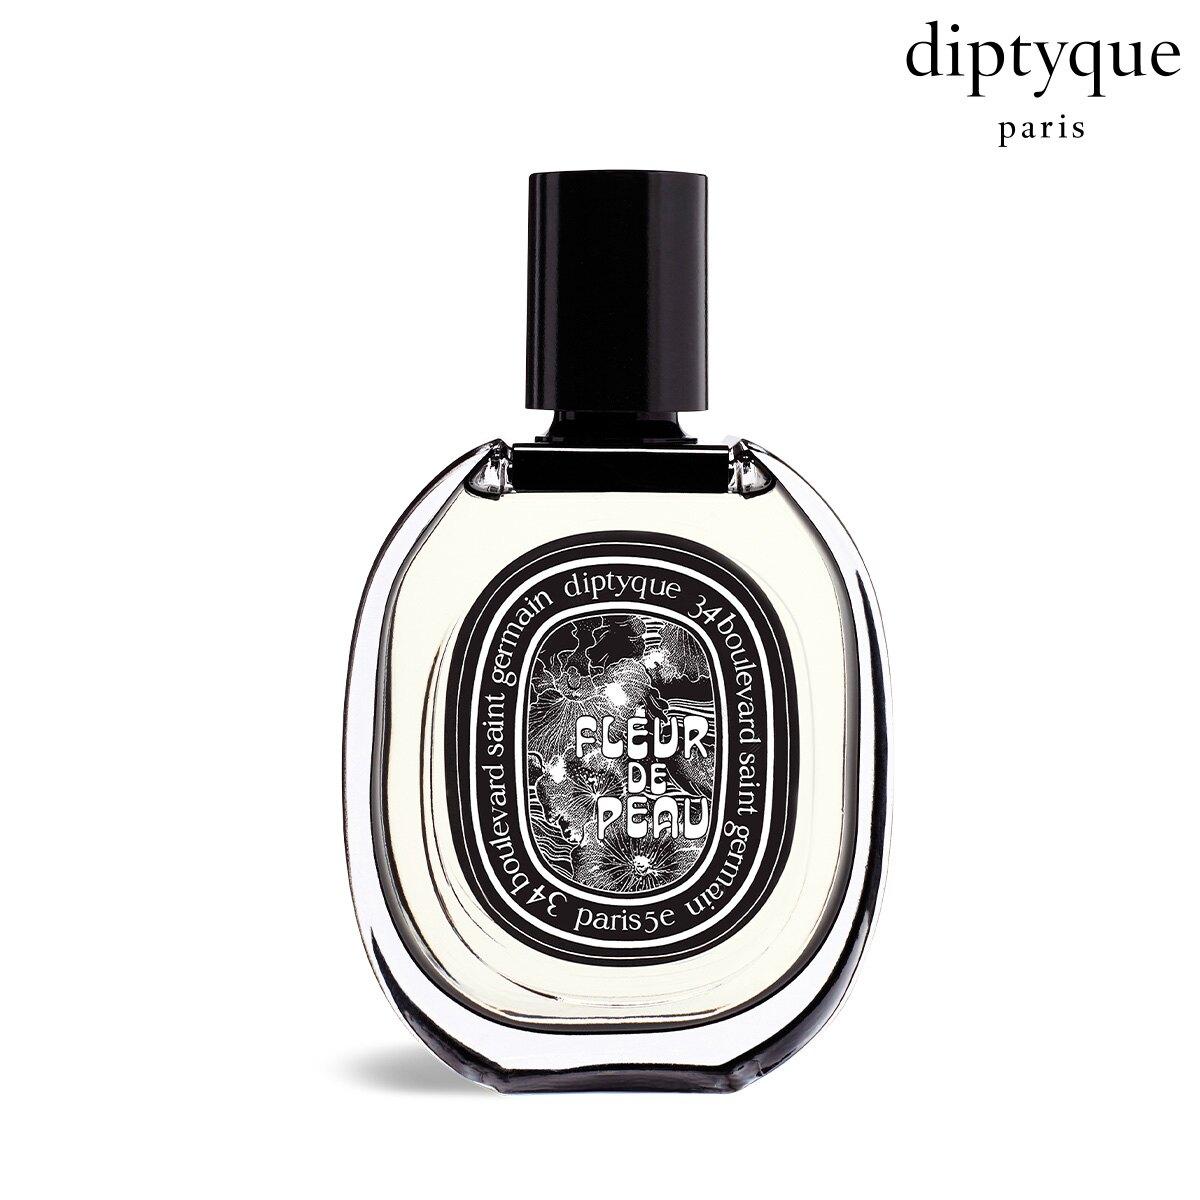 Diptyque 肌膚之華淡香精 Fleur de Peau 75ml 中性香水【SP嚴選家】。人氣店家Select Plus的----- 【熱門促銷】-----有最棒的商品。快到日本NO.1的Rak